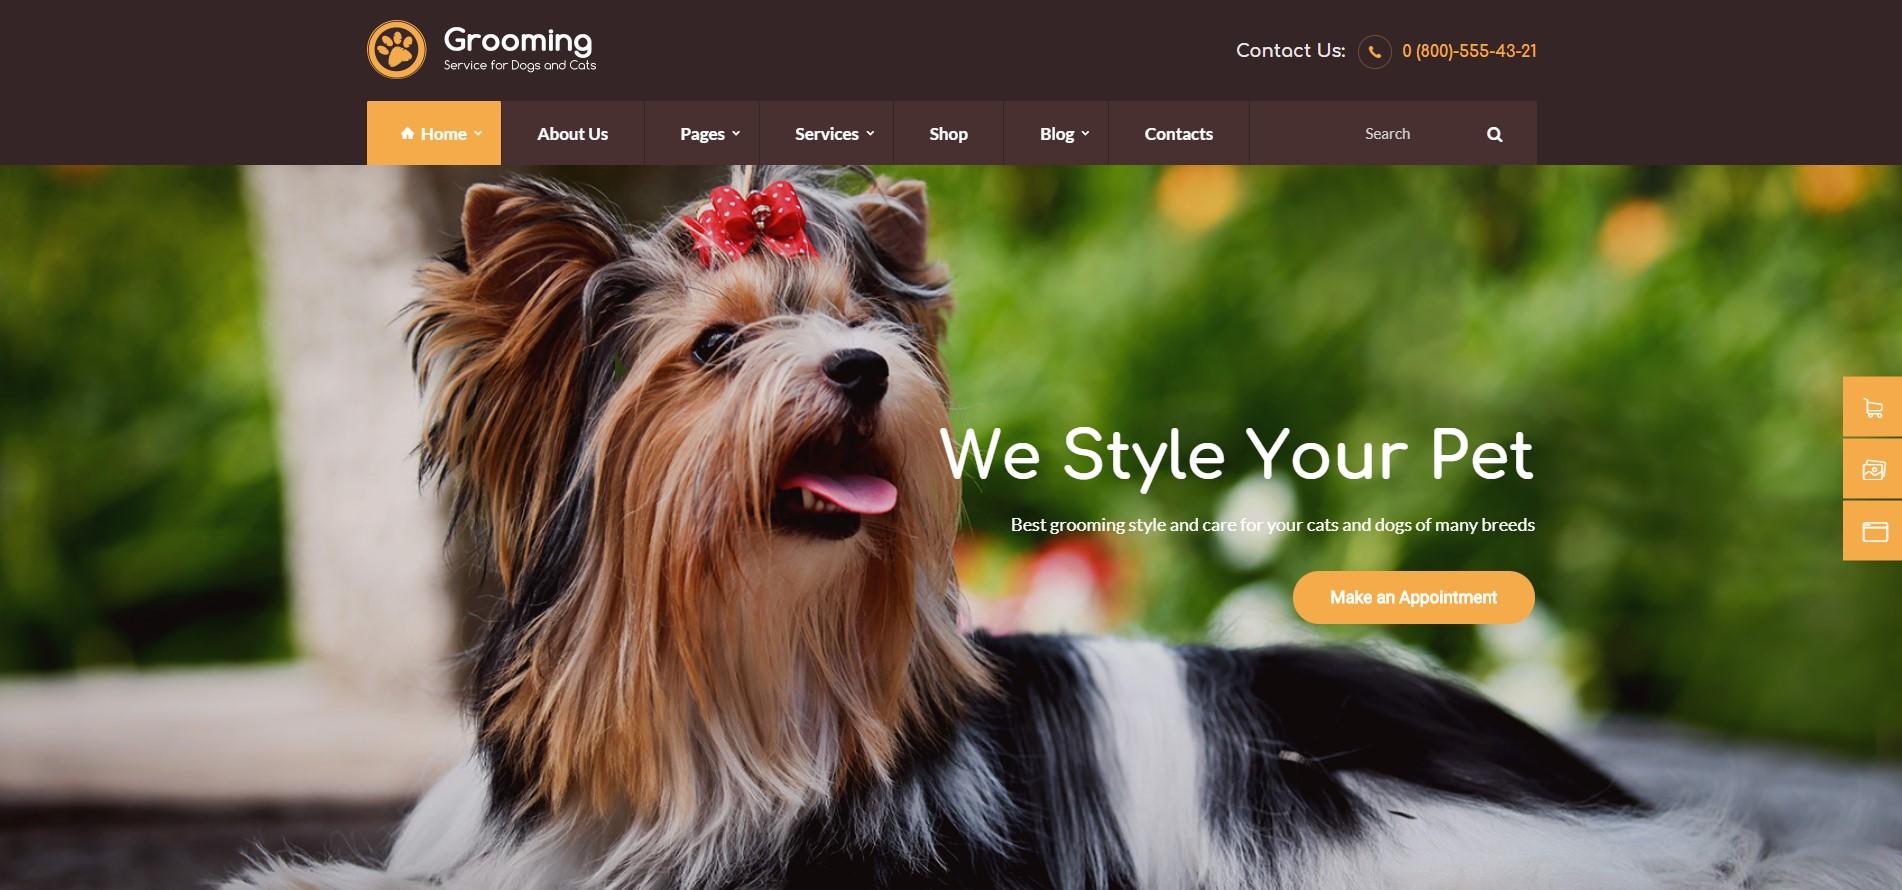 Grooming - Pet Shop & Veterinary Physician WordPress Theme